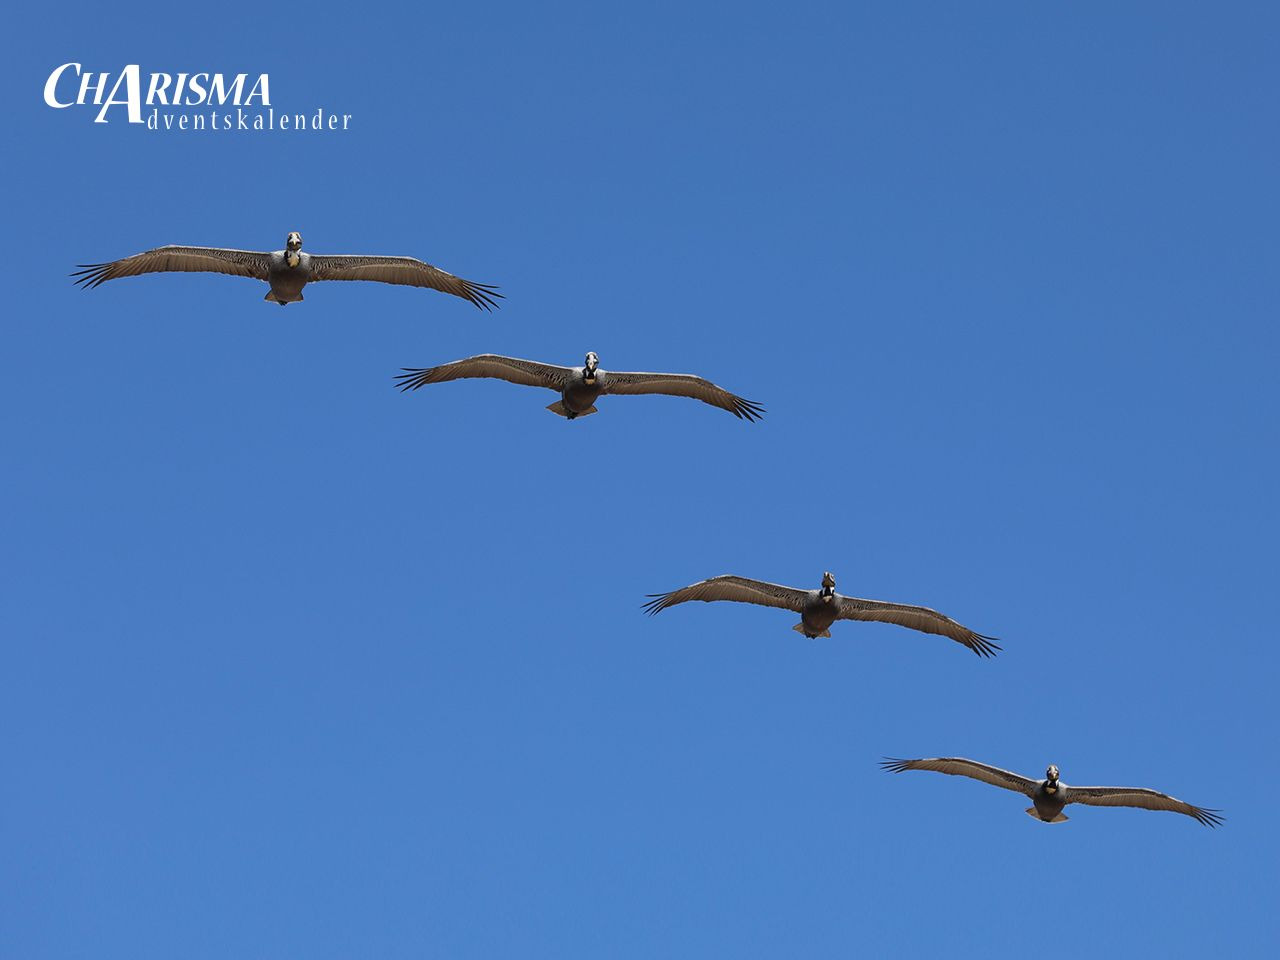 Vier Pelikane im Formationsflug